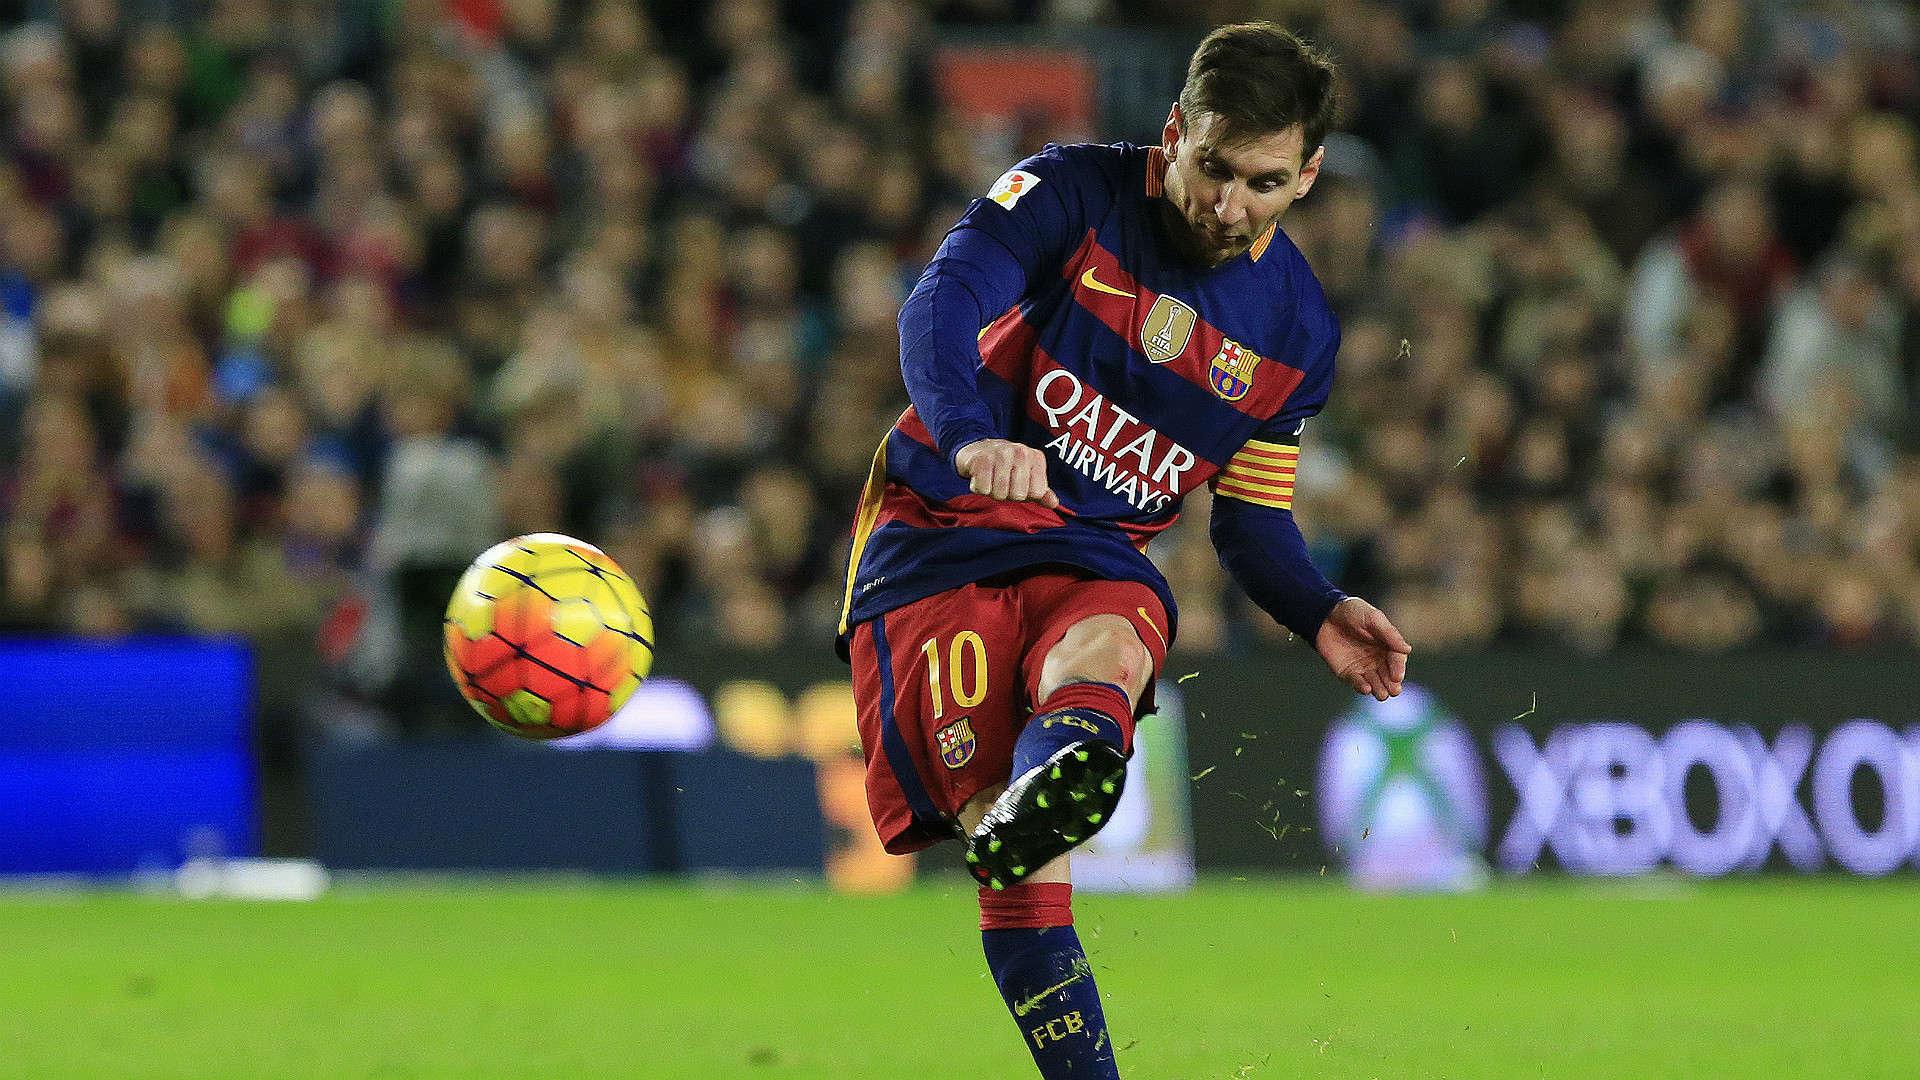 Hd wallpaper upload - Wallpaper Messi Hd Wallpapers 1080p 2015 Upload At January 7 2016